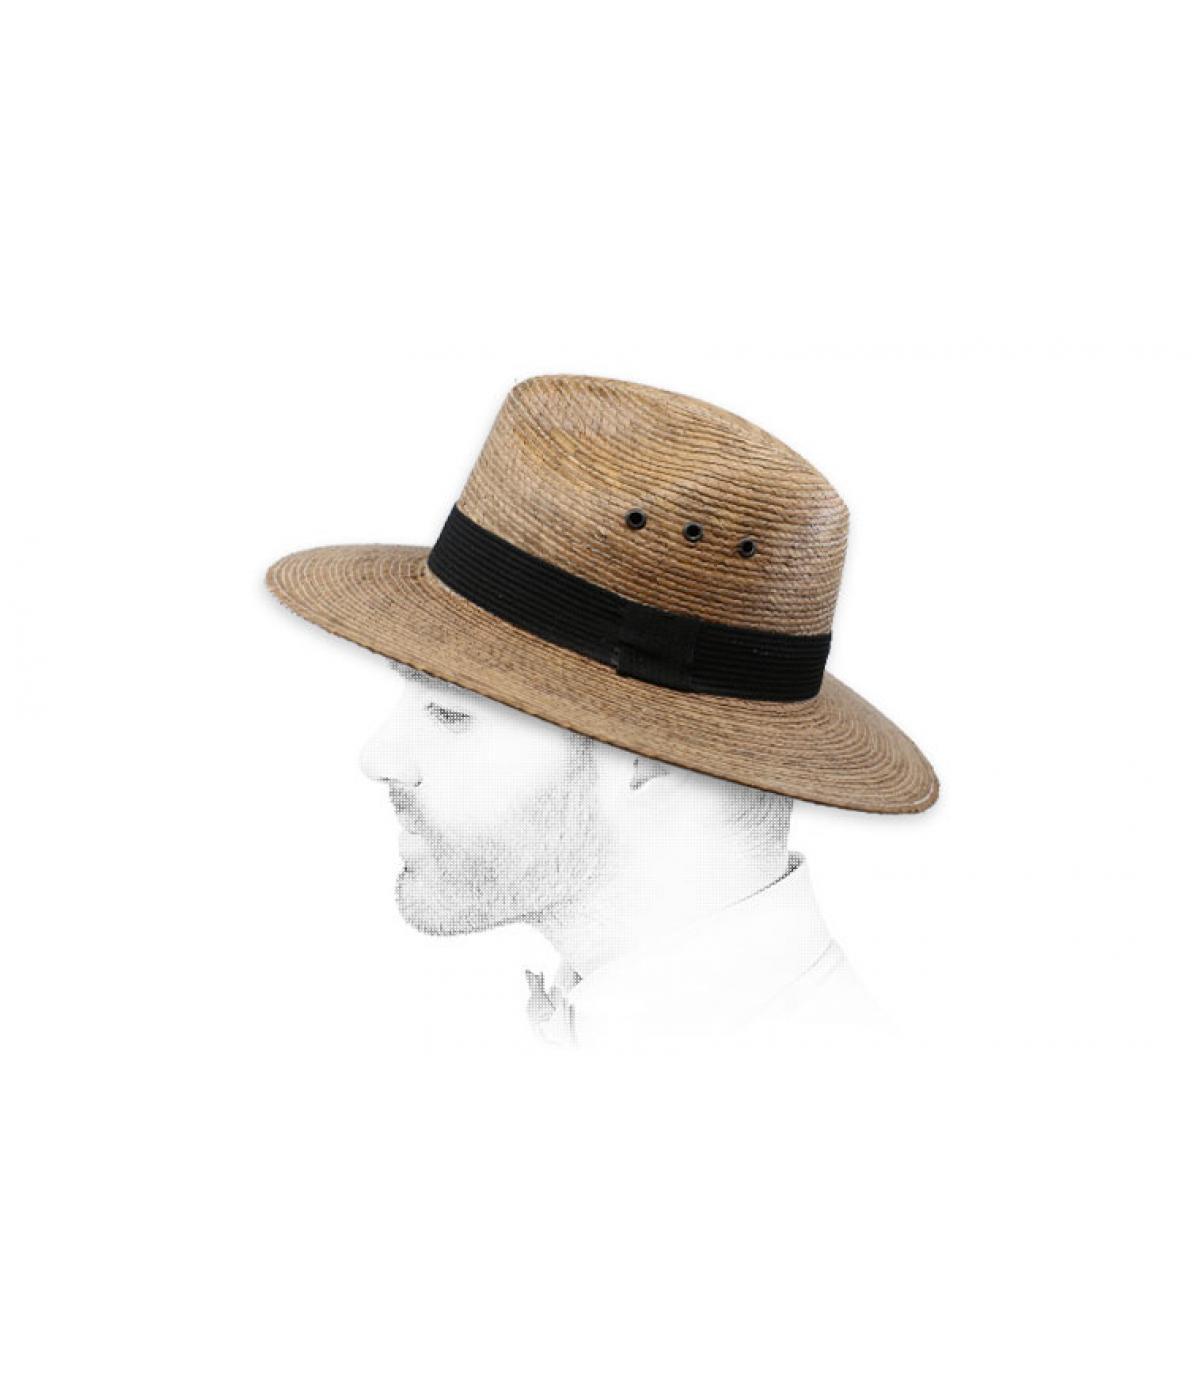 sombrero paja ojete cinta